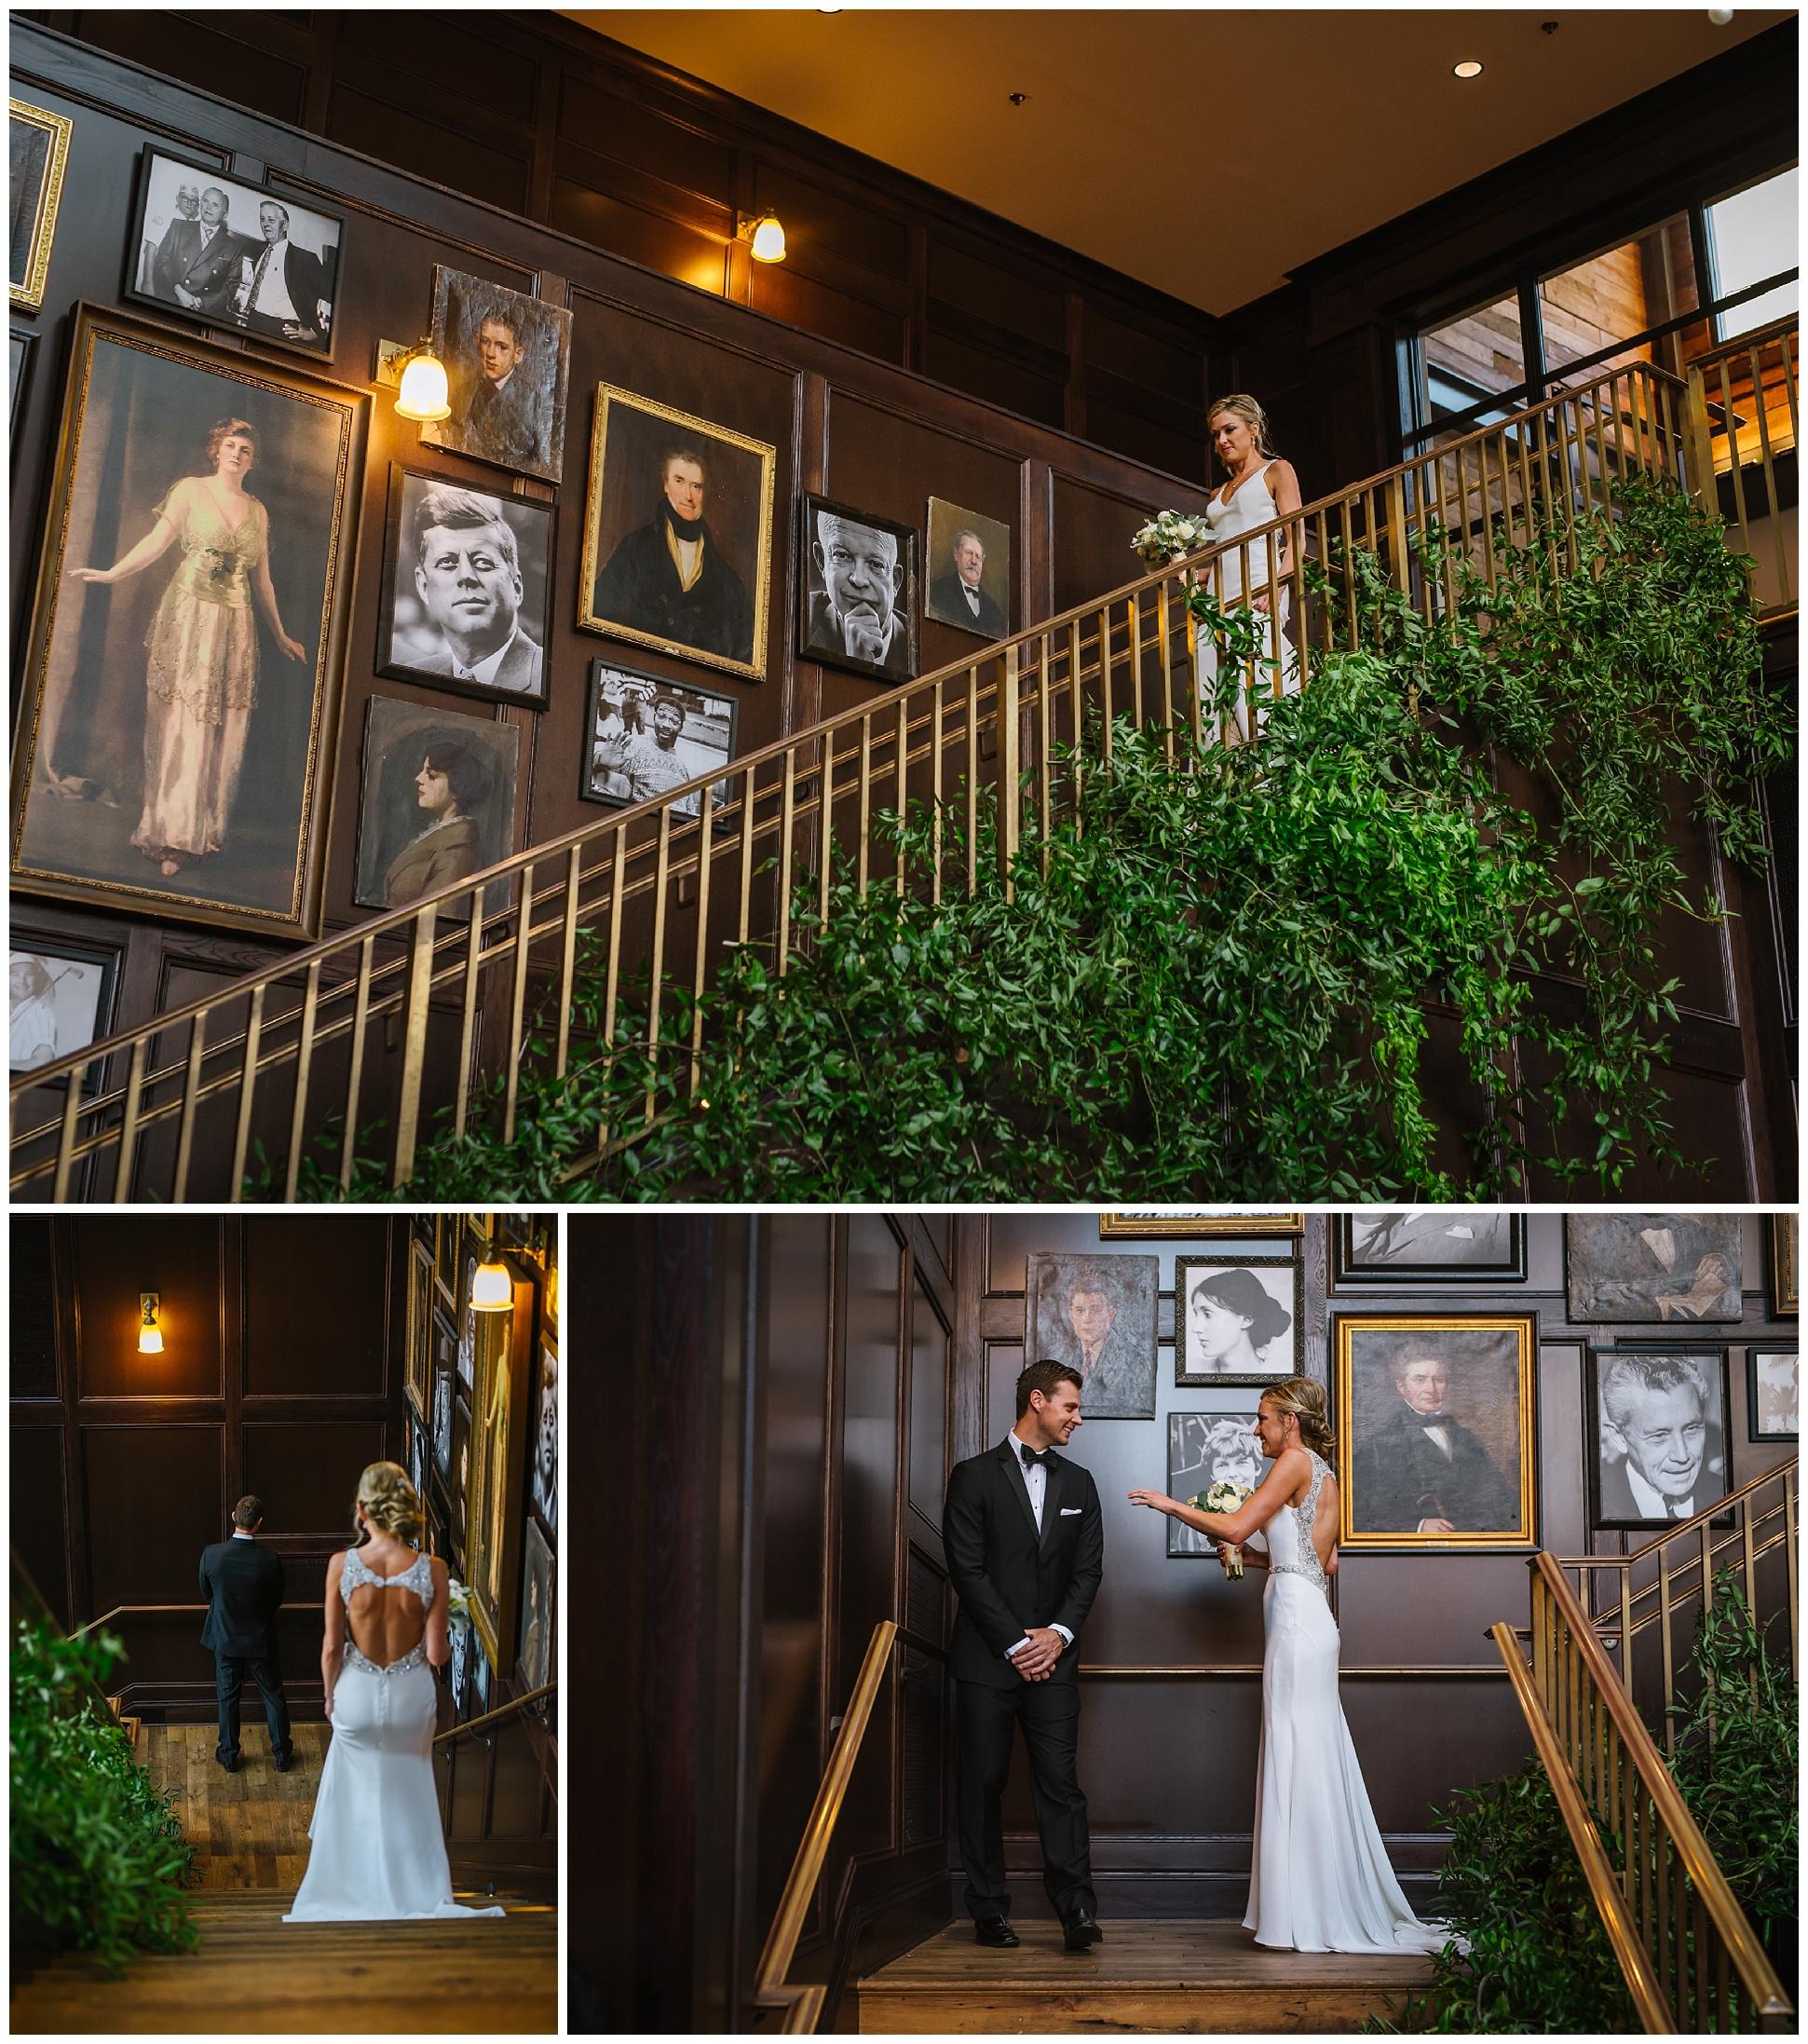 Oxford-exchange-wedding-photogapher-garland-candels-bookstore-burgandy-botanica_0026.jpg